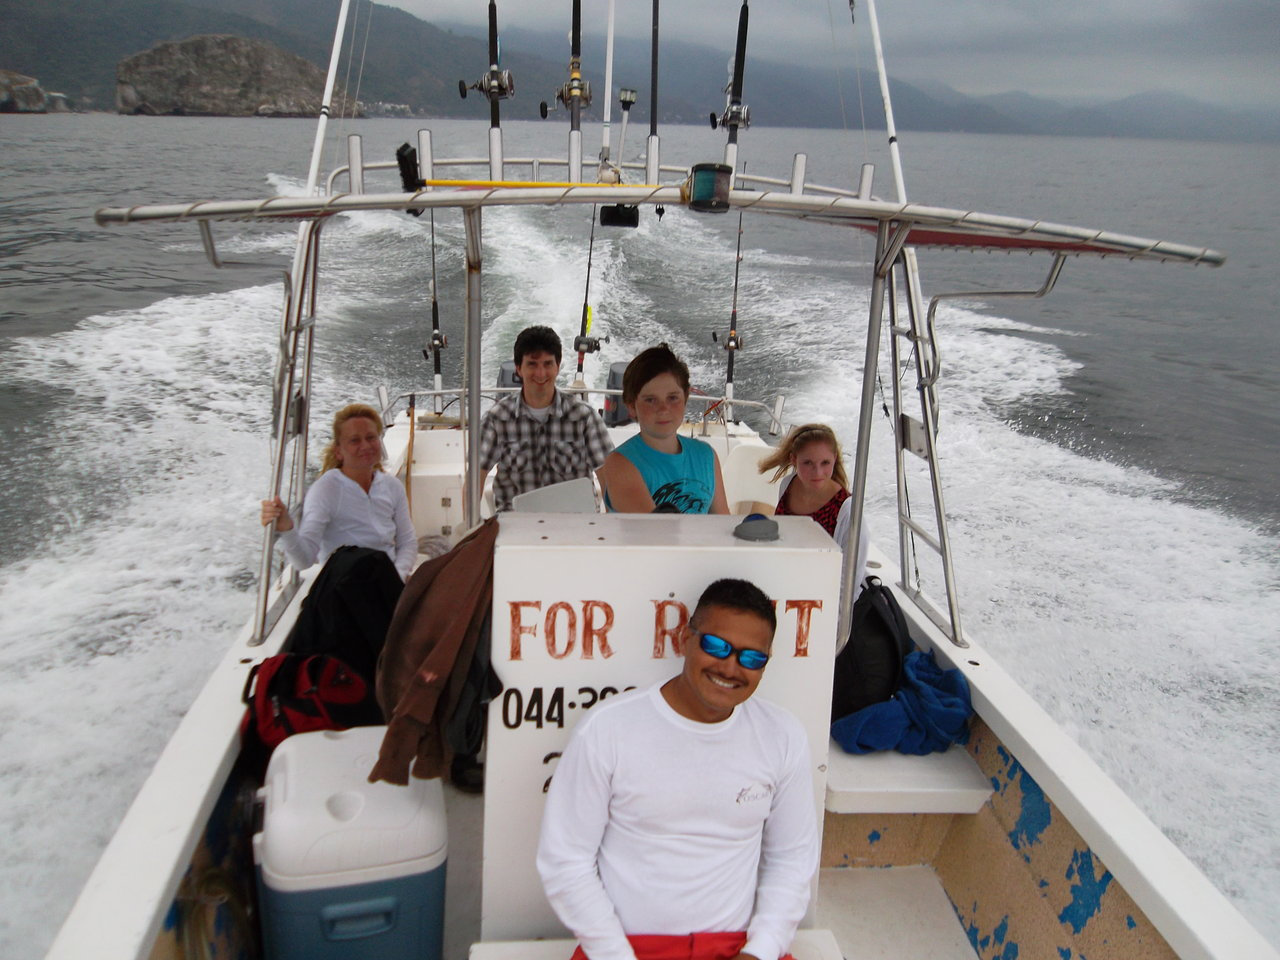 NOT FISHING REBELS boat similar to photo